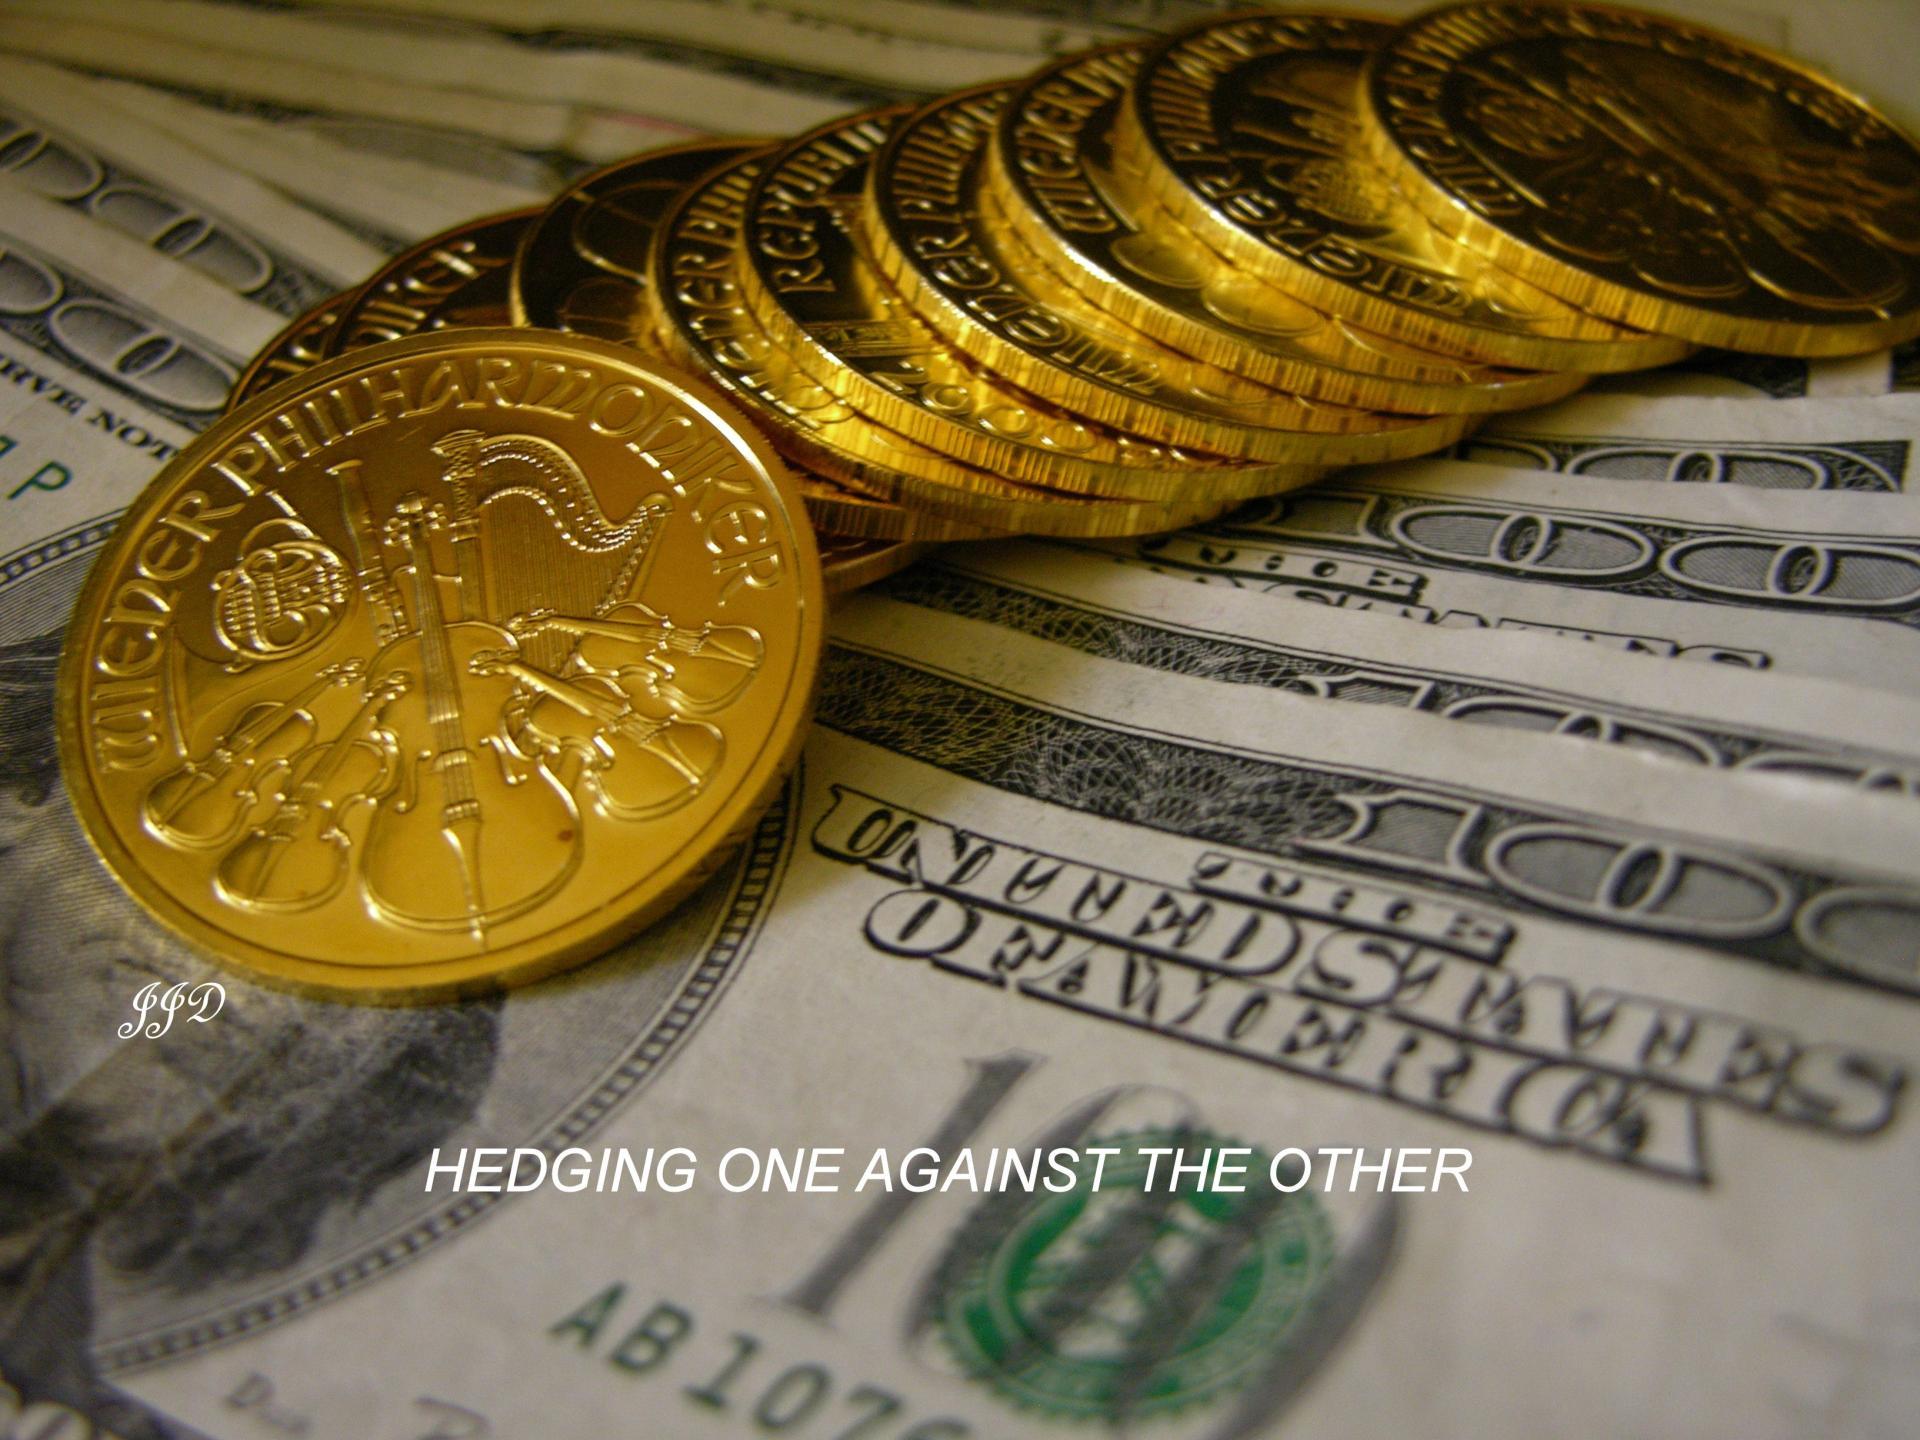 заработать биткоинах как 2017 на-15